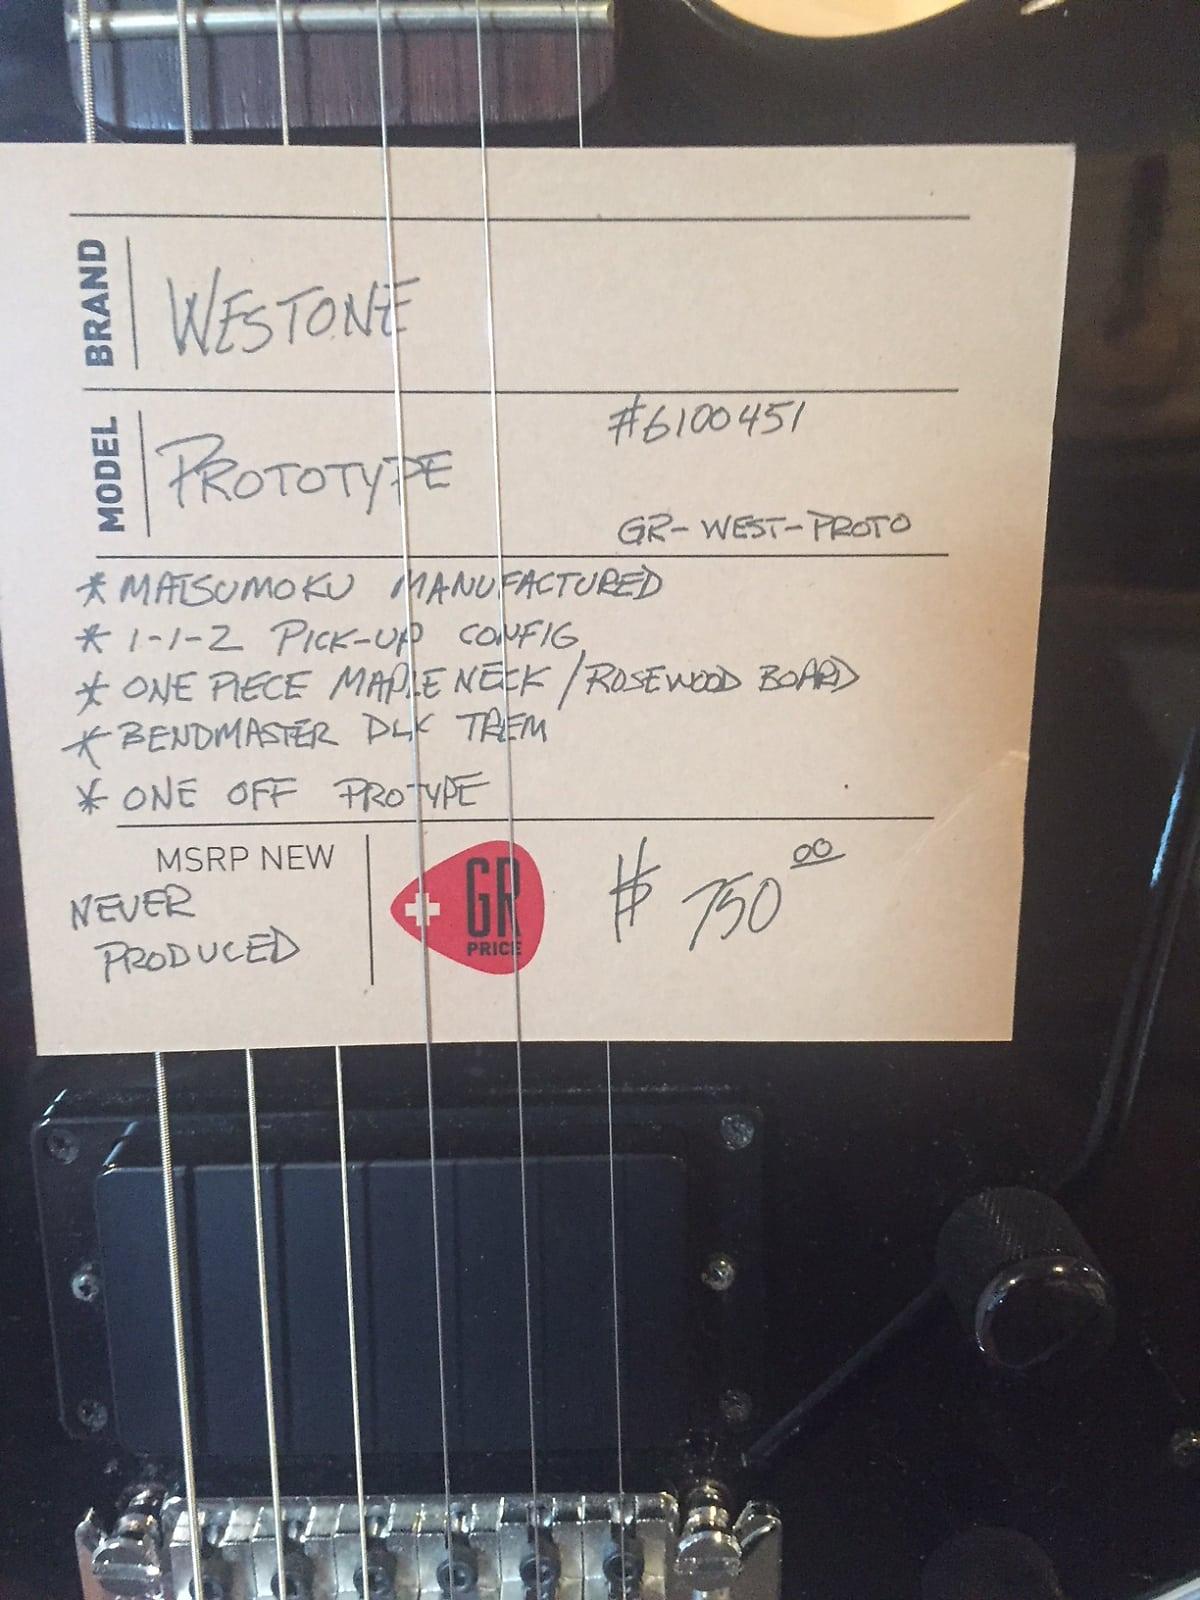 westone - Westone Prototype at Reverb Tsgns1sbigyd1mbzkccn